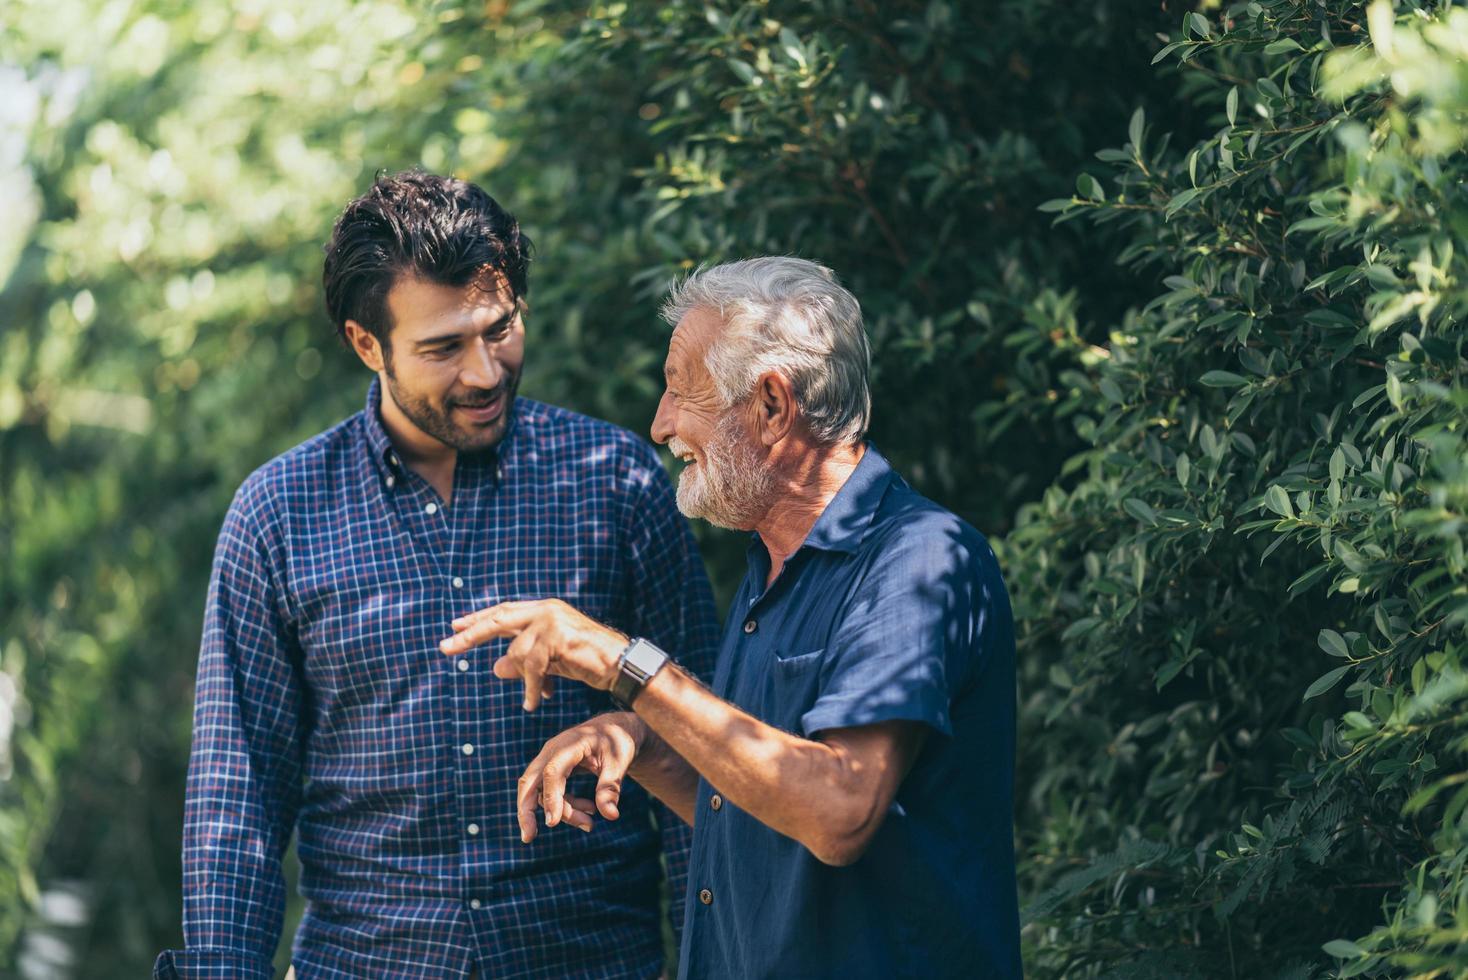 viejo padre e hijo adulto relajarse en el patio trasero foto